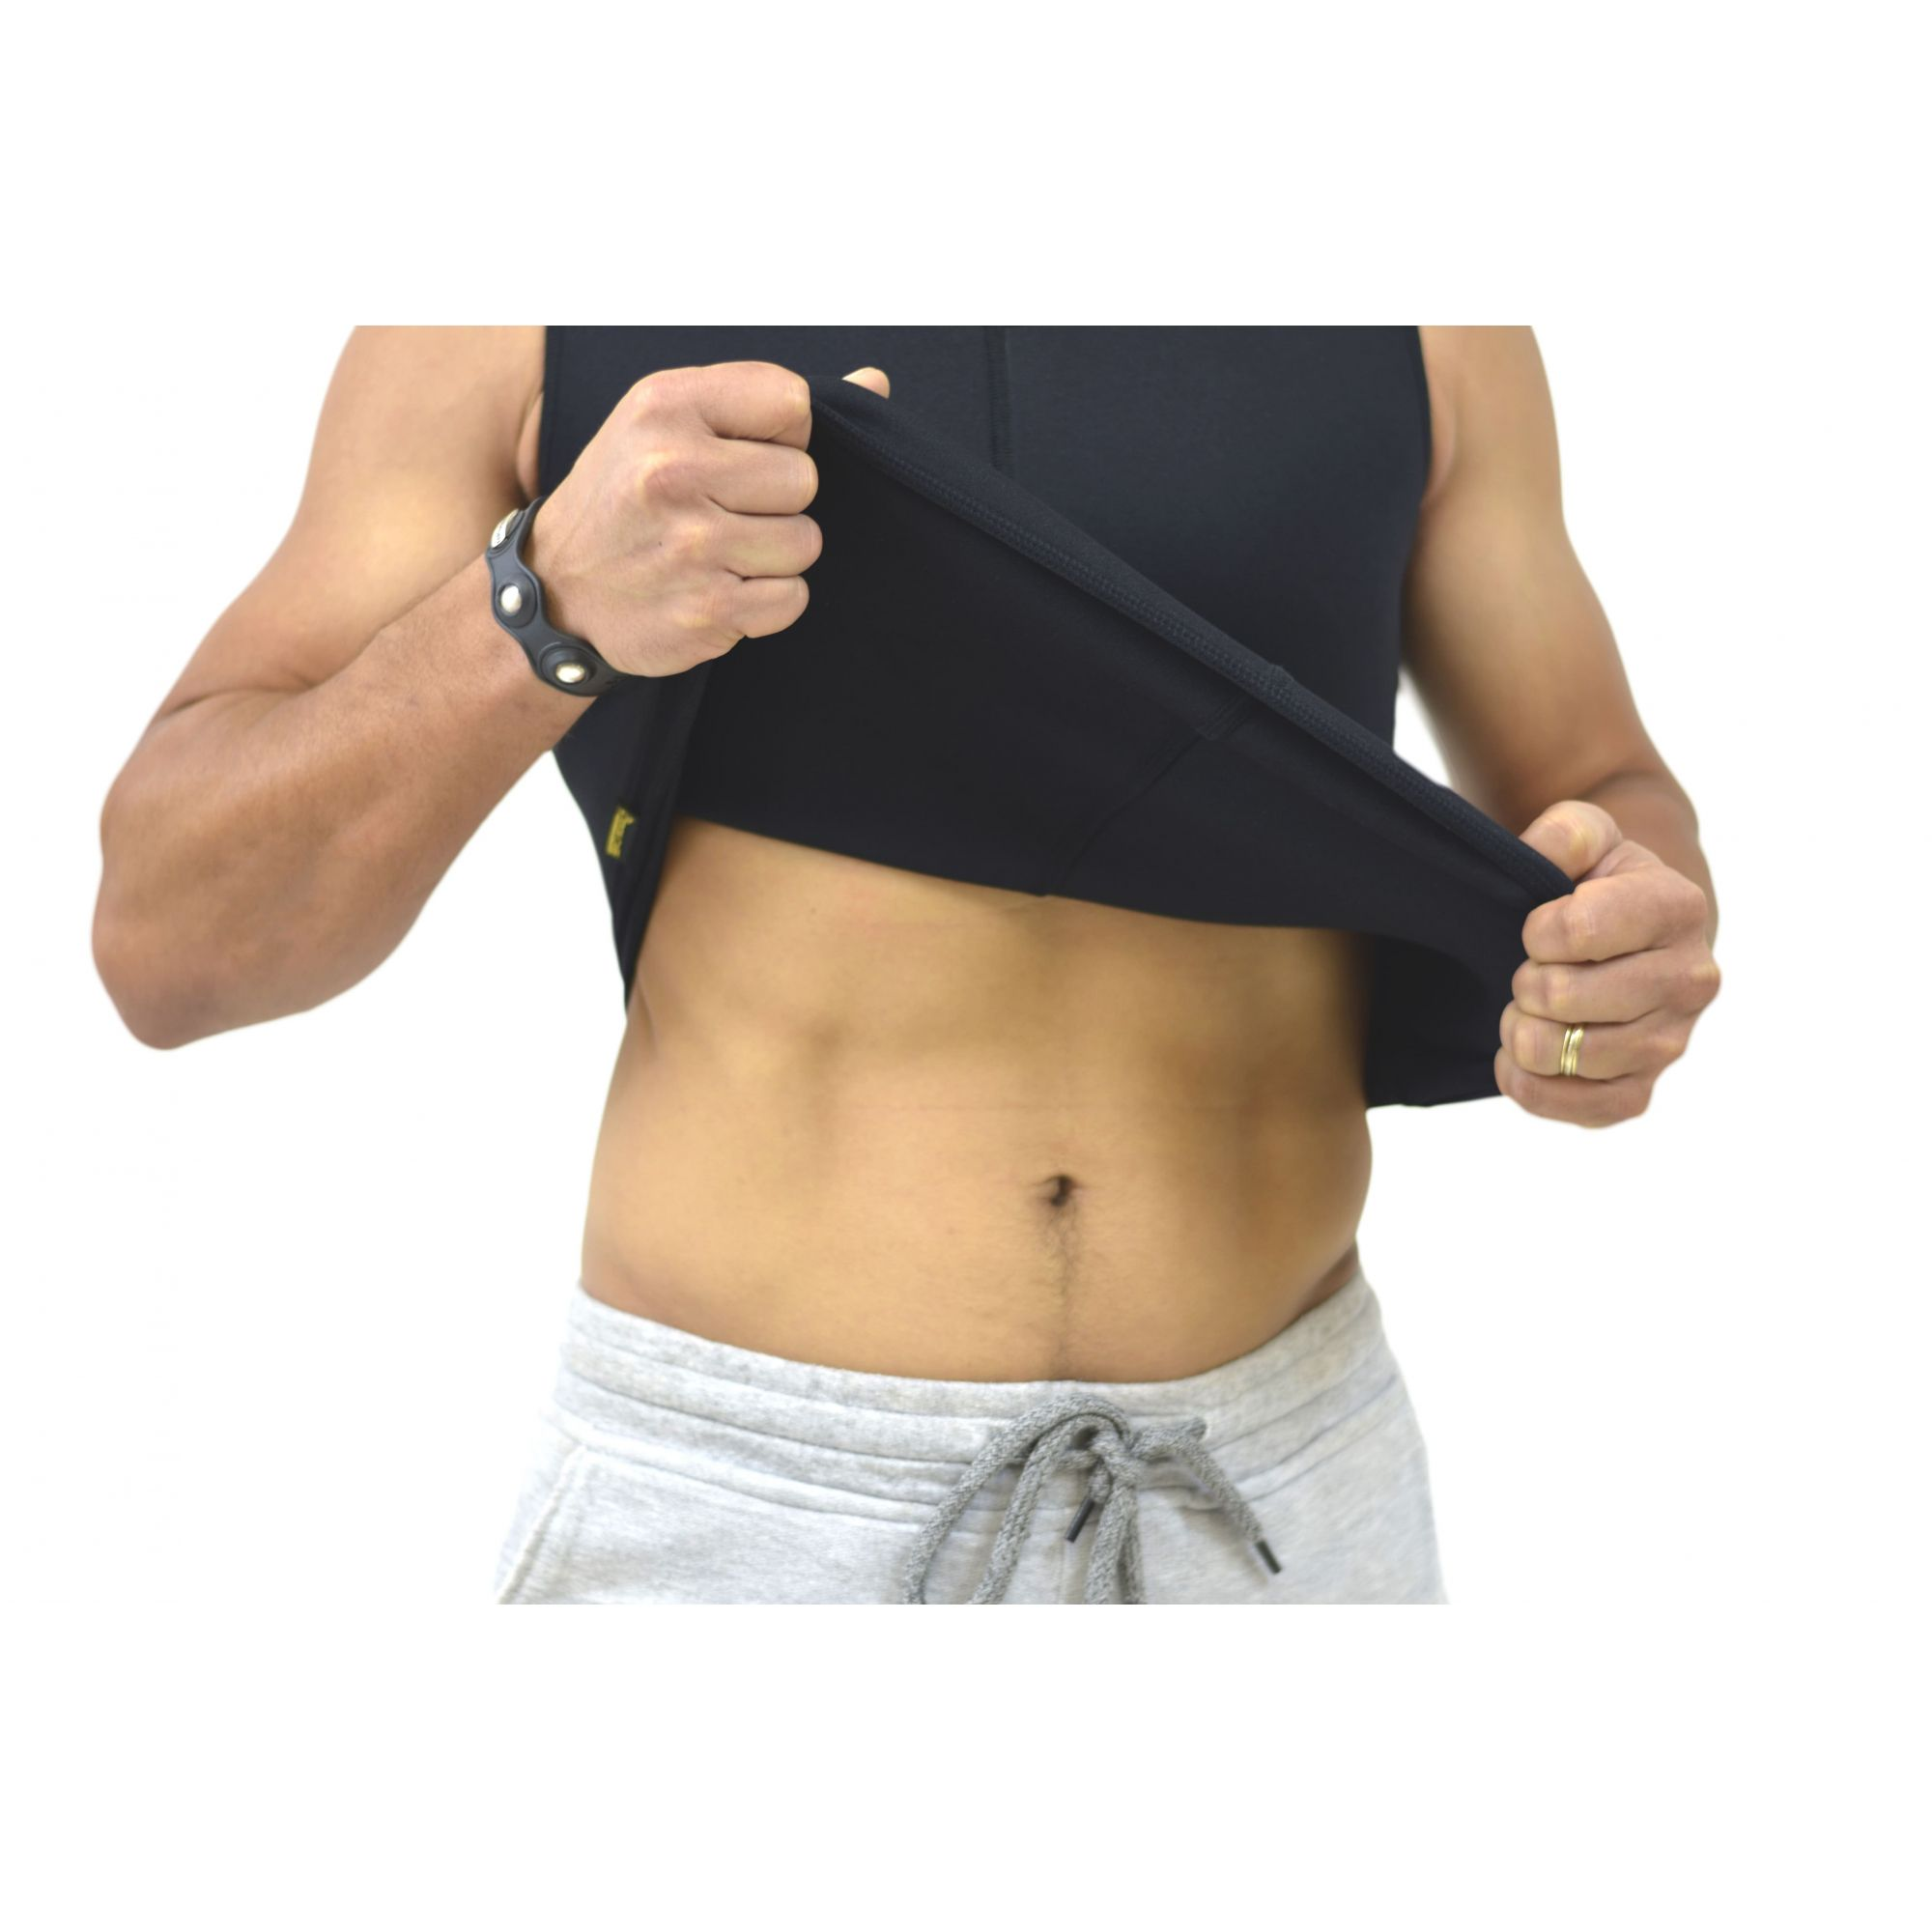 T-Shirt NeoFire - Camiseta Modeladora térmica Masculina